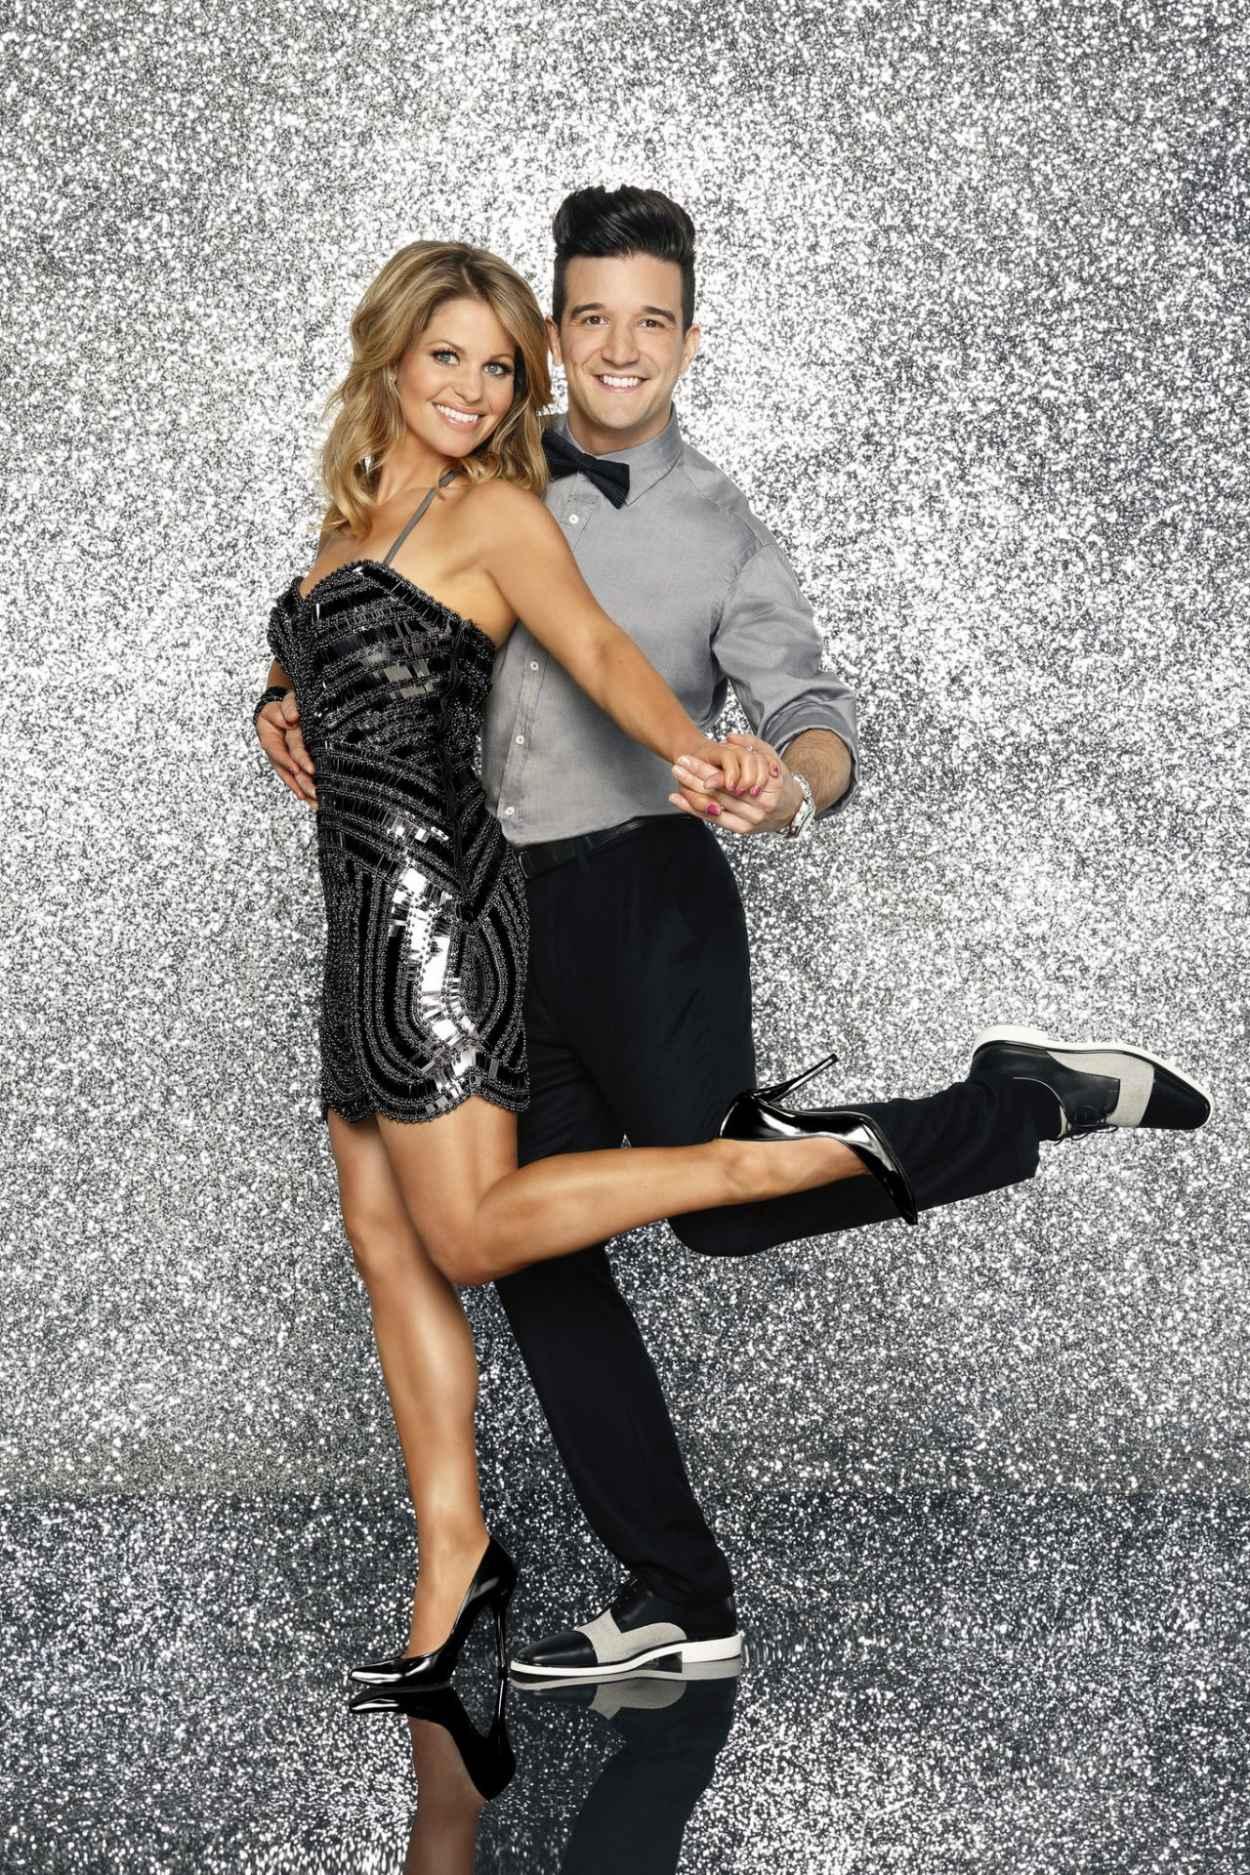 Candace Cameron Bure & Mark Ballas - Dancing with the Stars - Season 18 - Promo Photo-1